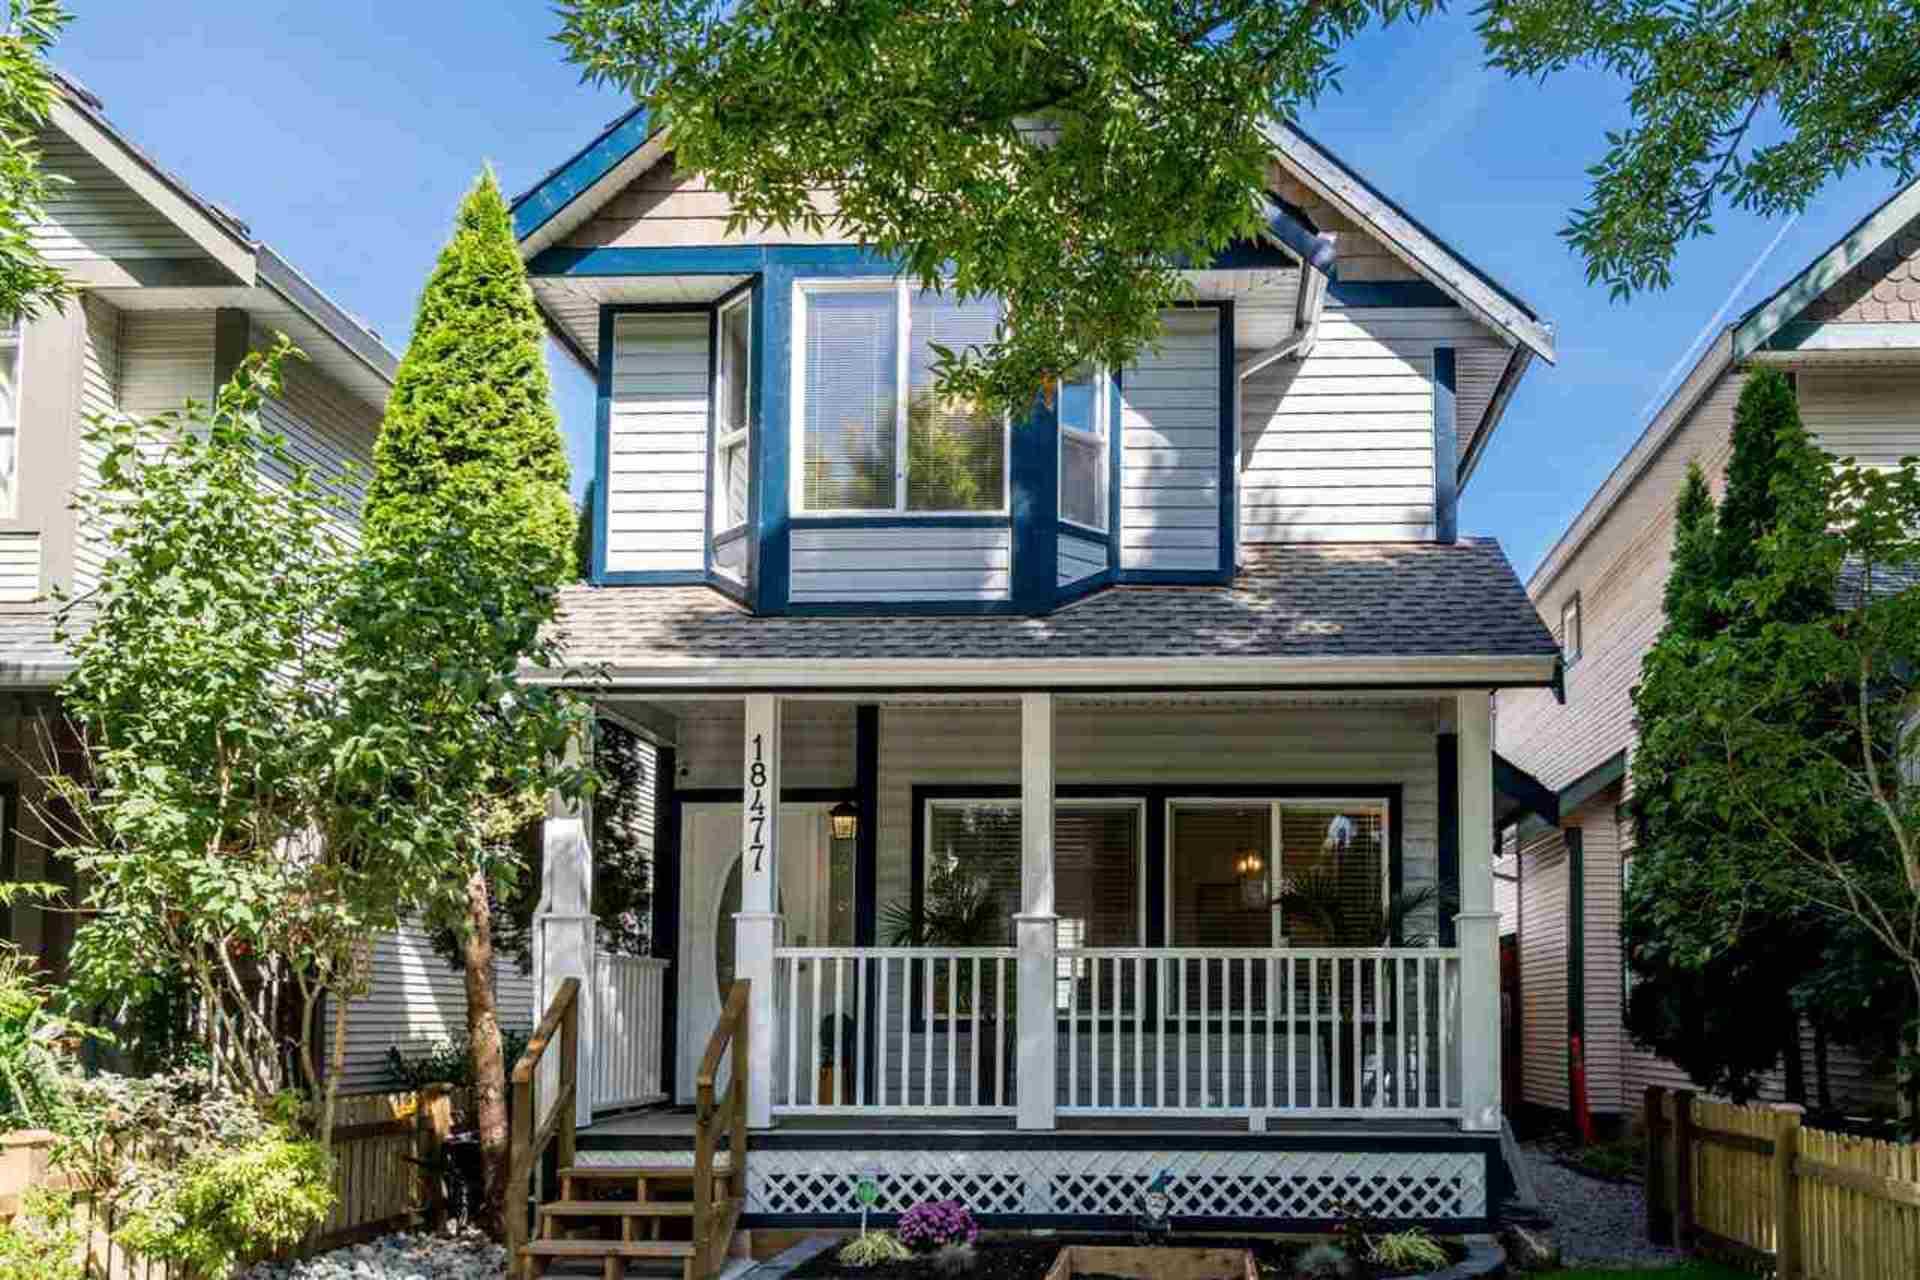 18477-66-avenue-cloverdale-bc-cloverdale-01 at 18477 66 Avenue, Cloverdale BC, Cloverdale